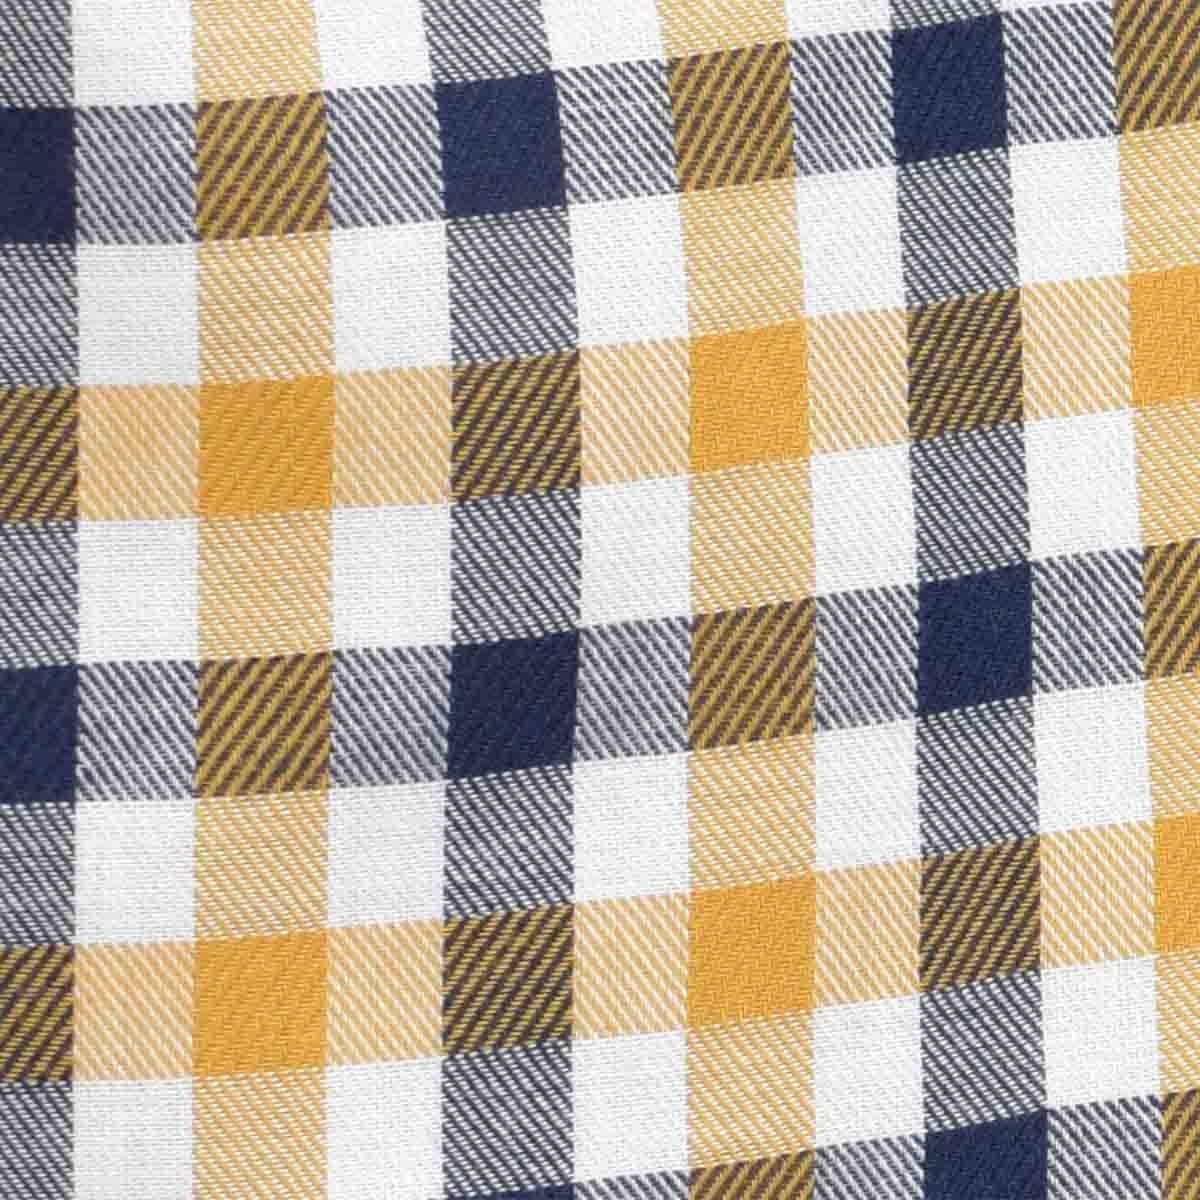 Camisa Manga Larga Casual Cuadros Amarillo Carlo Corinto para Caballero